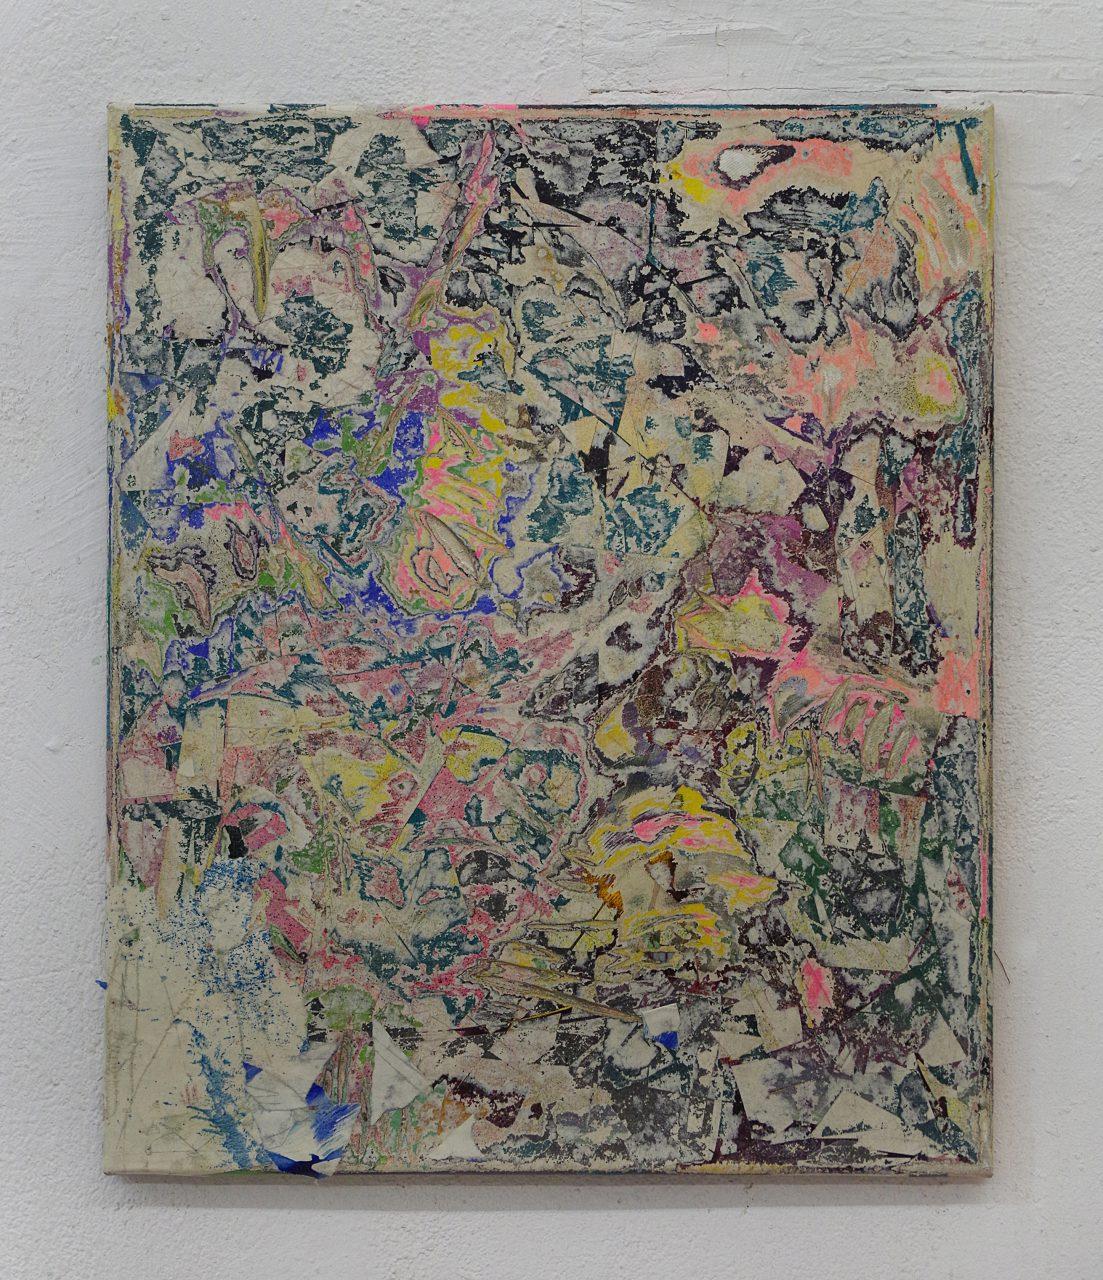 2016, Acryl, Spraypaint, Papier, Leinwand, Keilrahmen 60cm x 50cm